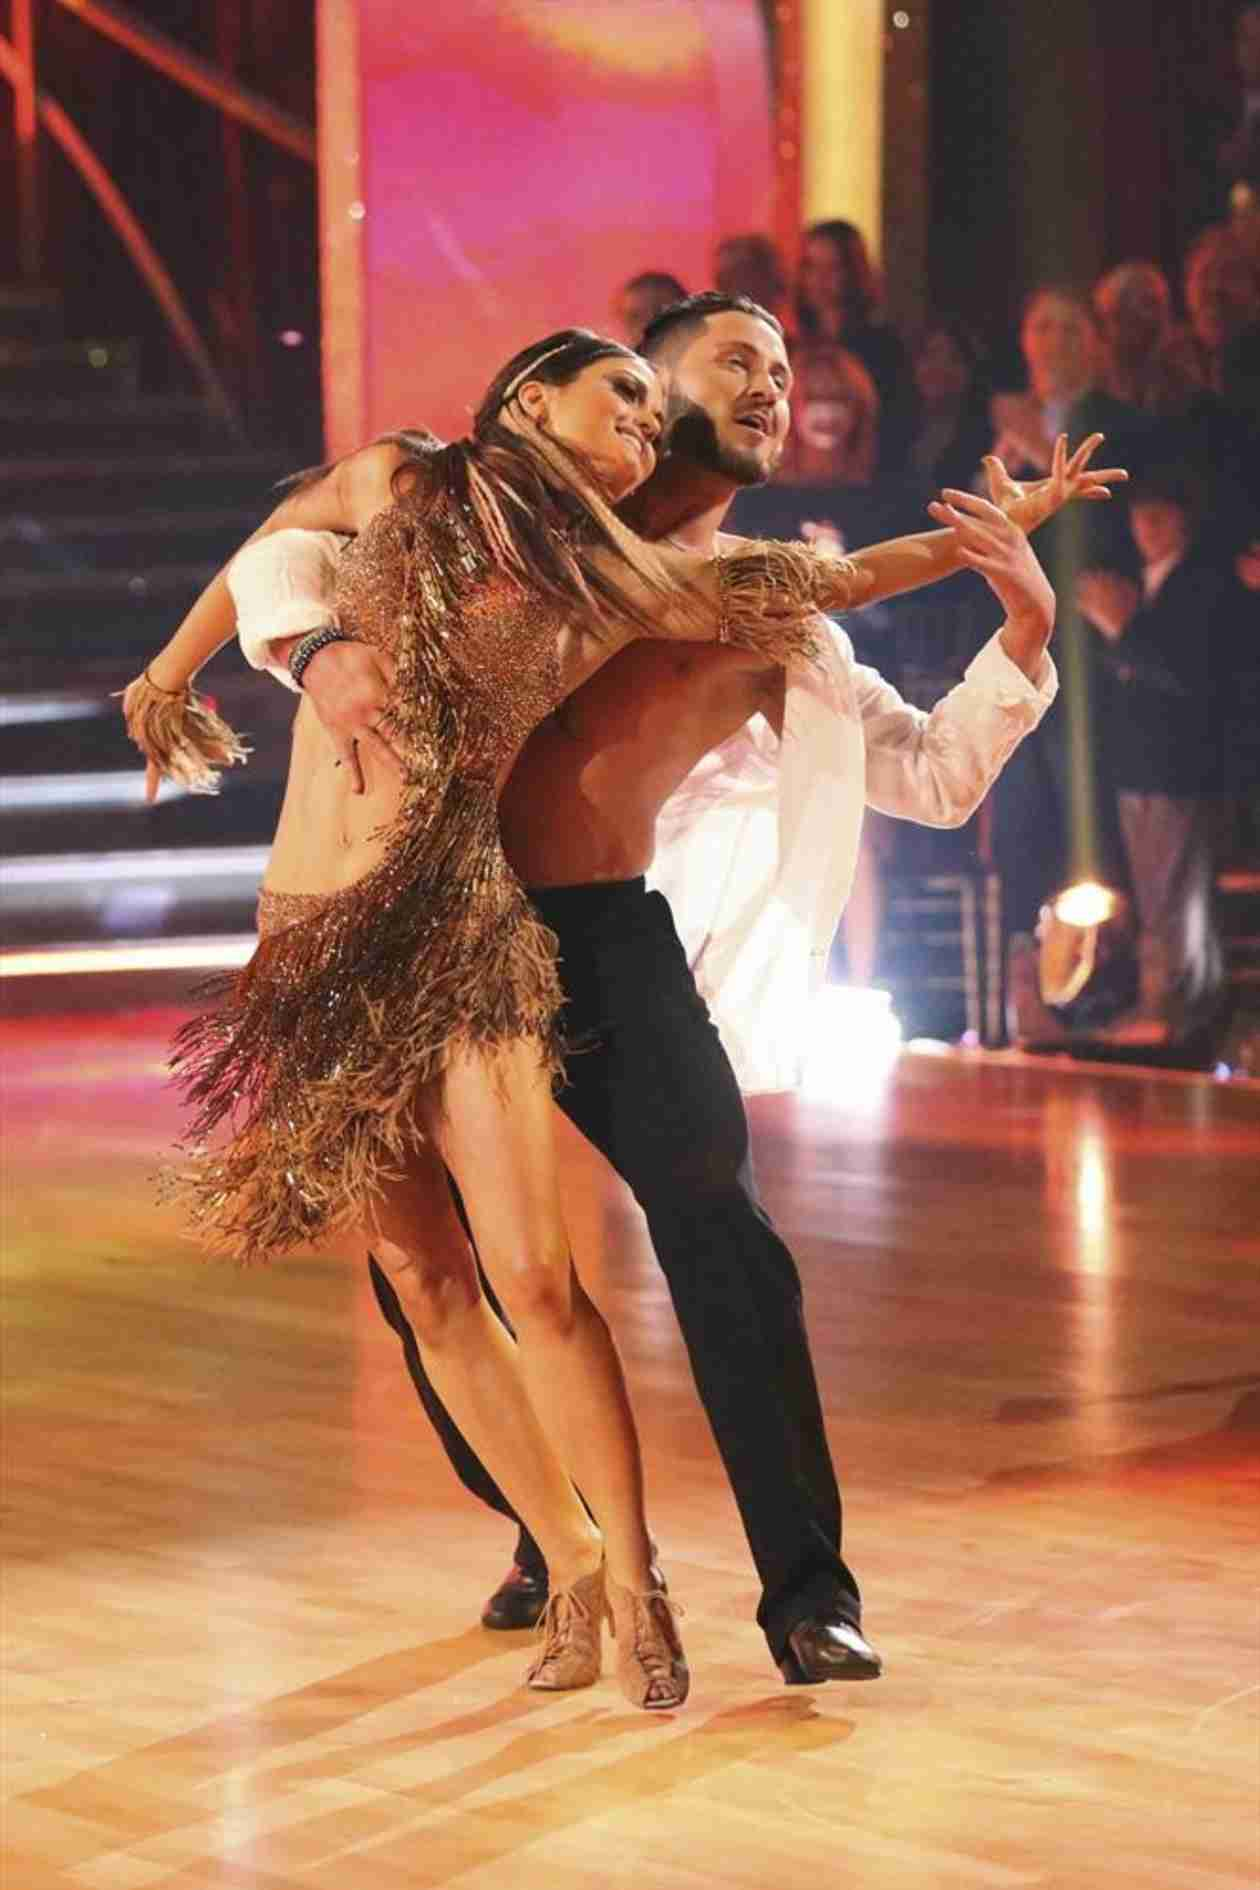 Dancing With the Stars 2014: Danica McKellar and Valentin Chmerkovskiy's Week 6 Cha-Cha-Cha (VIDEO)